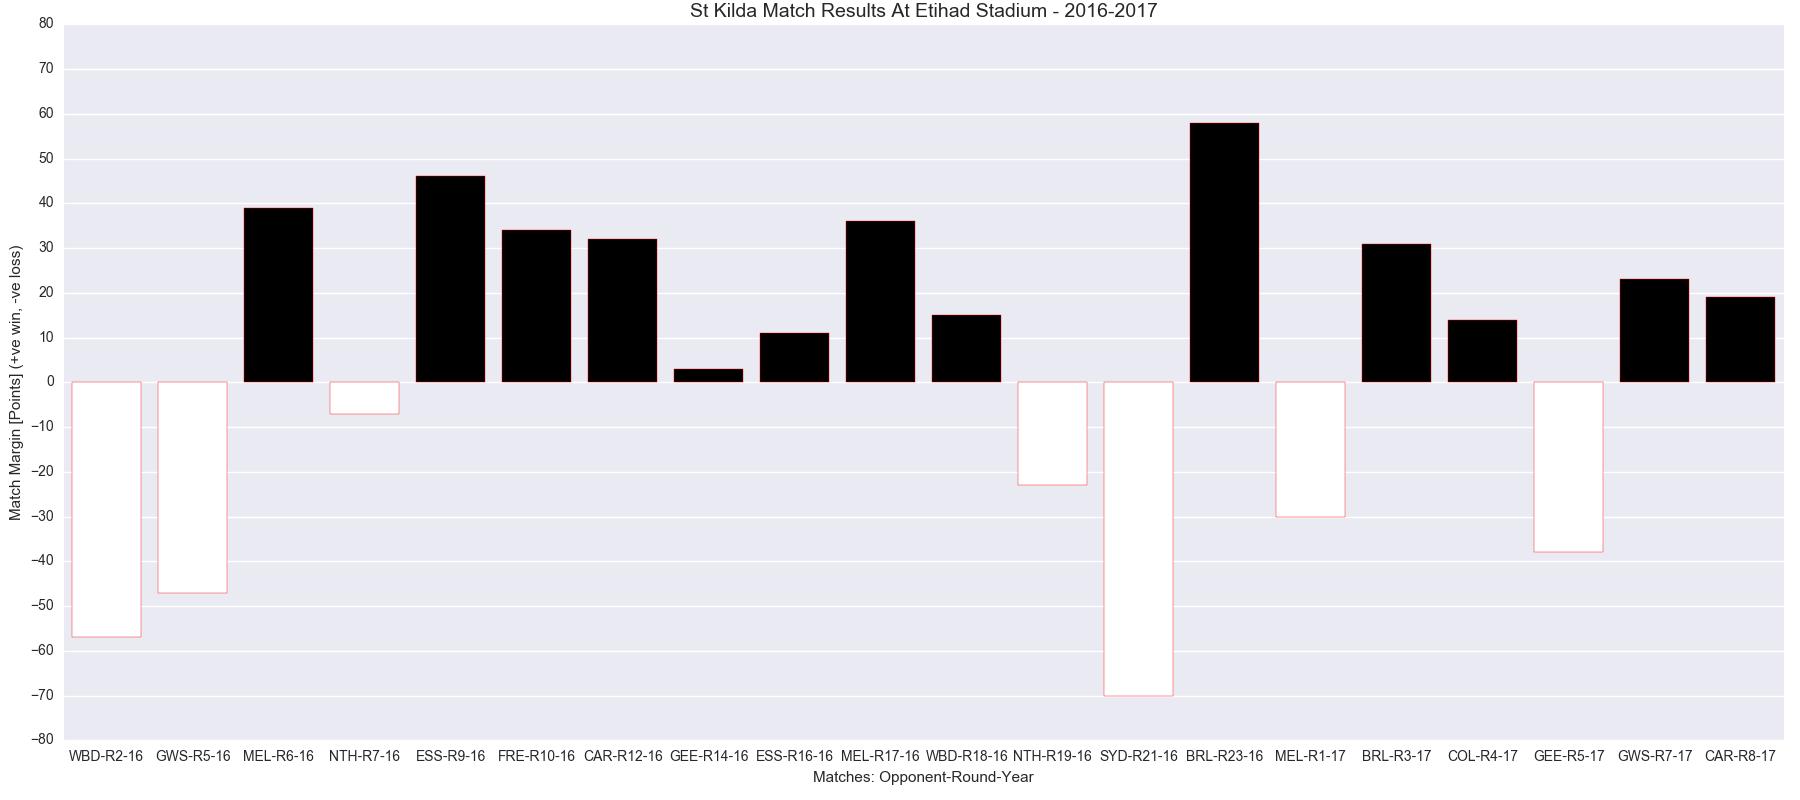 Figure-1: St Kilda Match Results at Etihad Stadium – 2016-2017